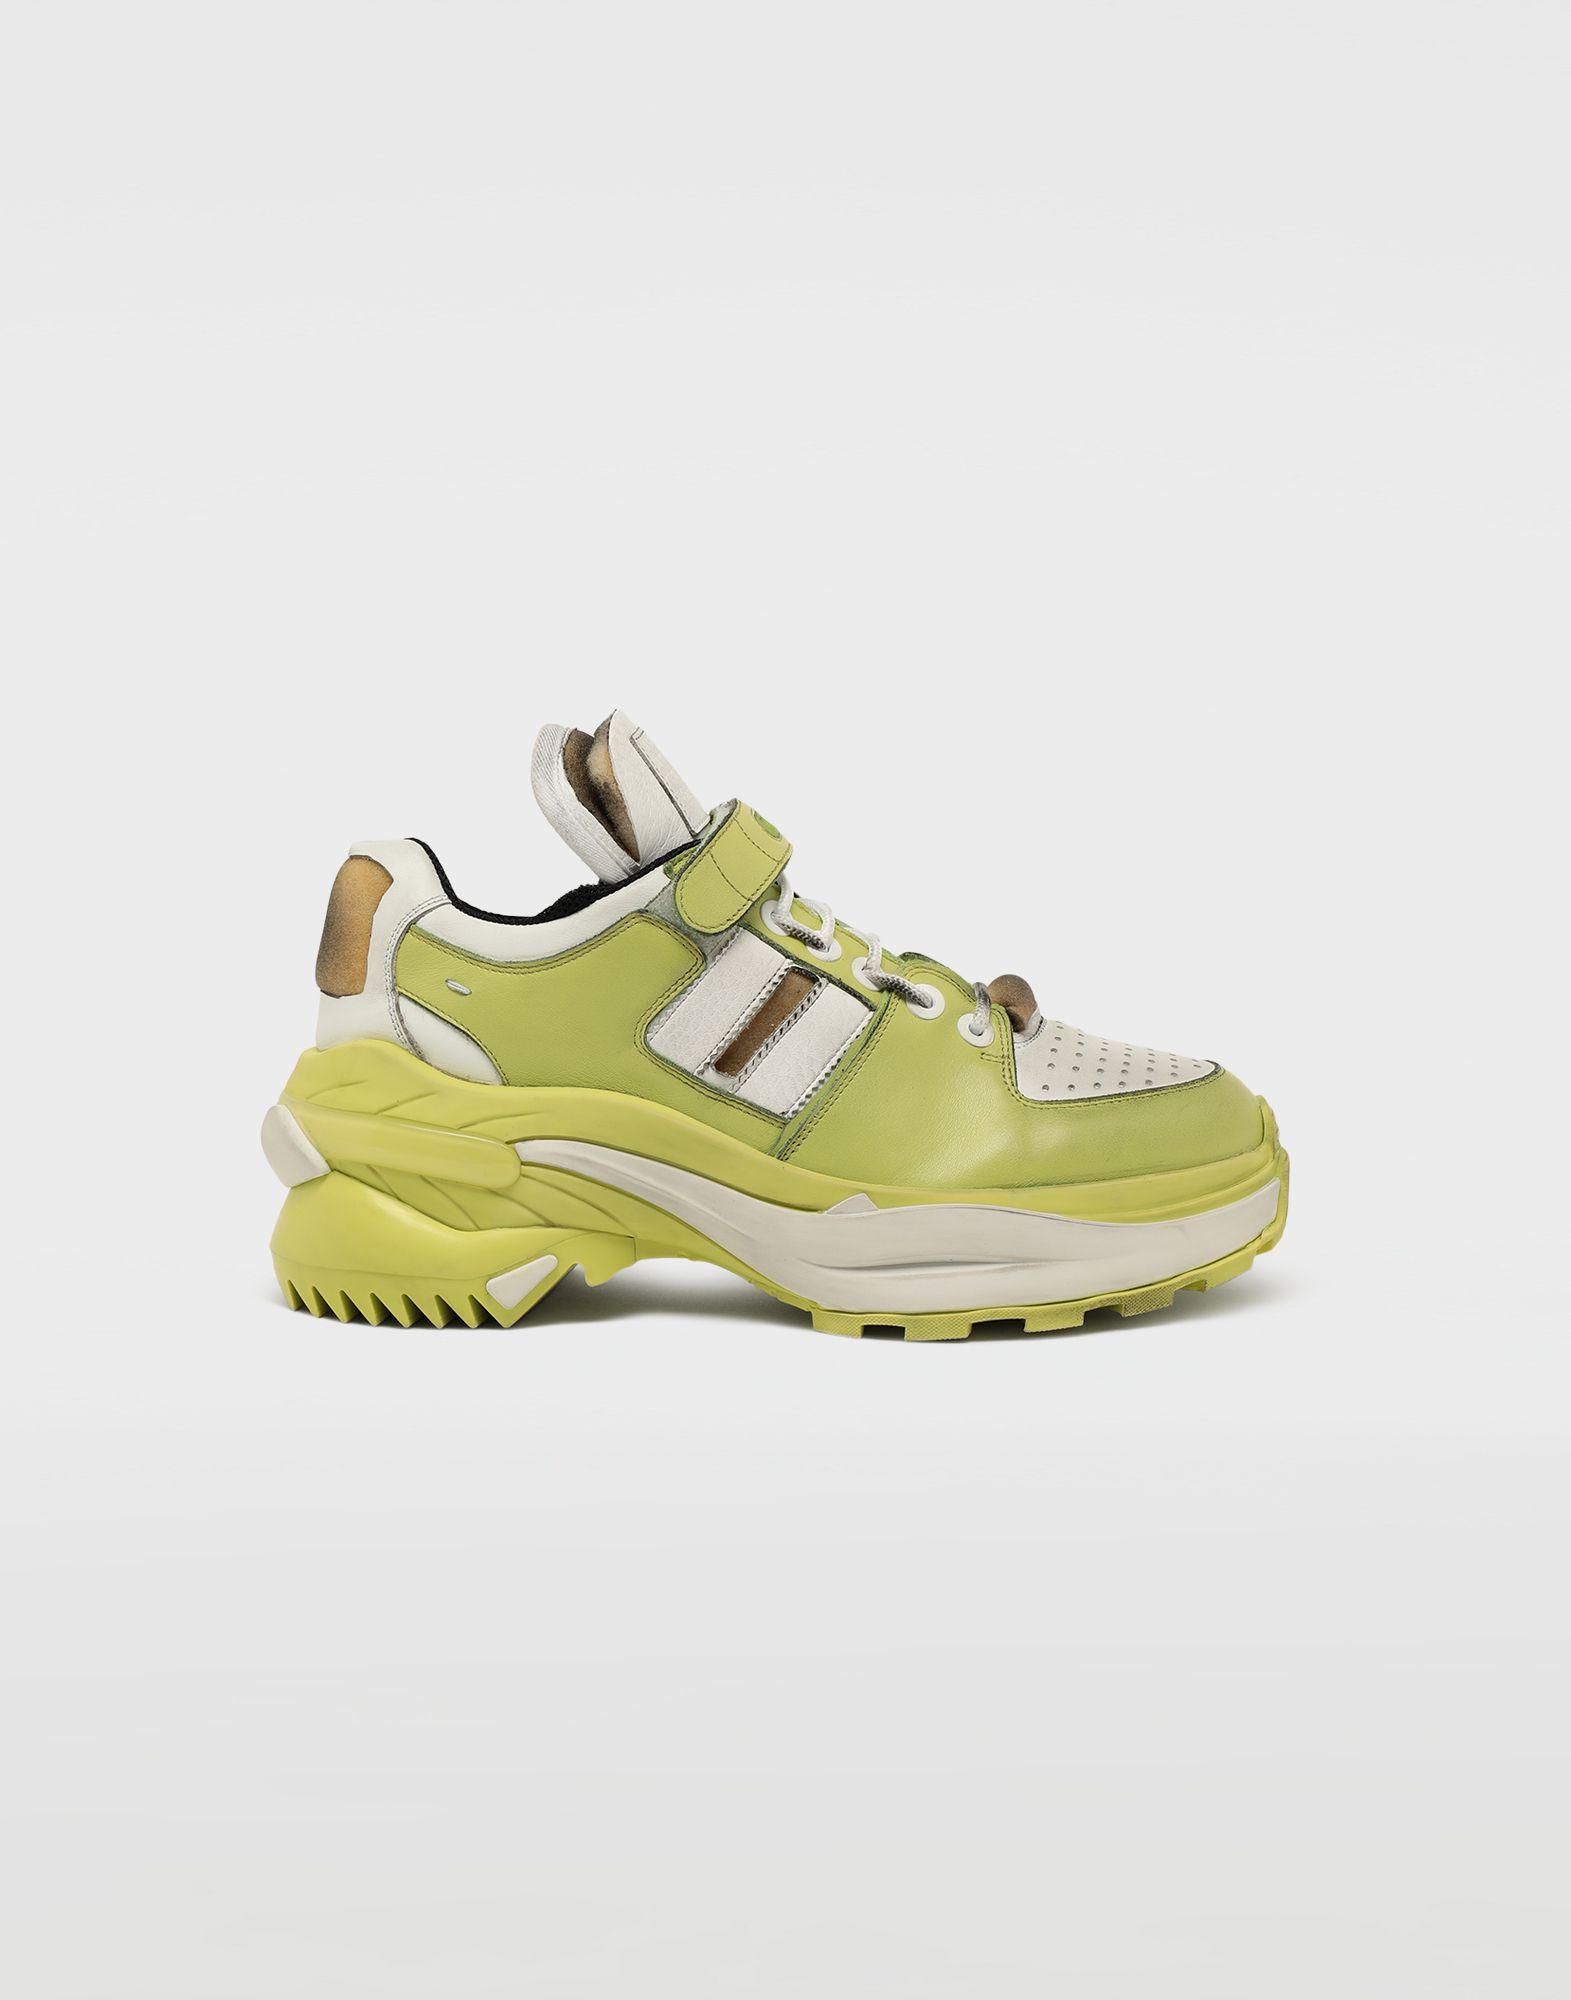 MAISON MARGIELA Low-Top-Sneakers Retro Fit Sneakers Herren f